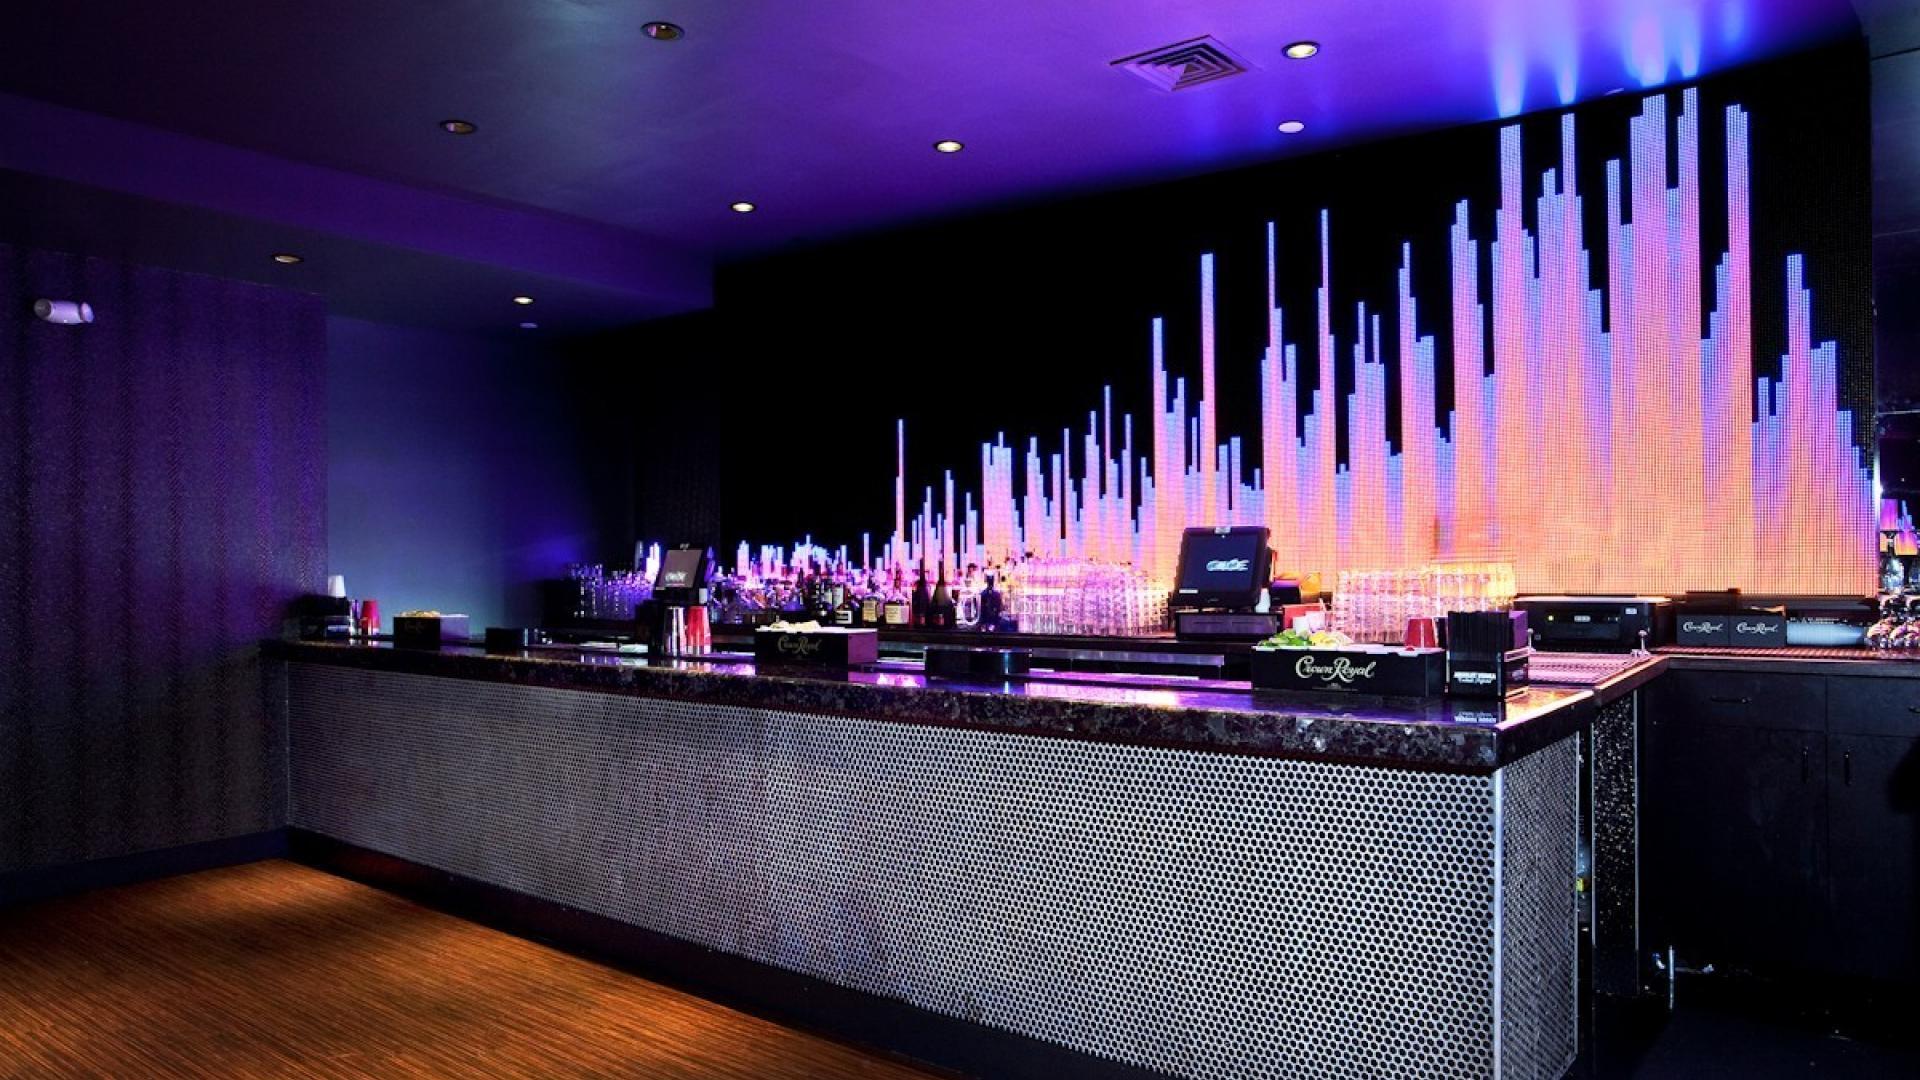 Bar Wallpapers Hd Pixelstalk Net